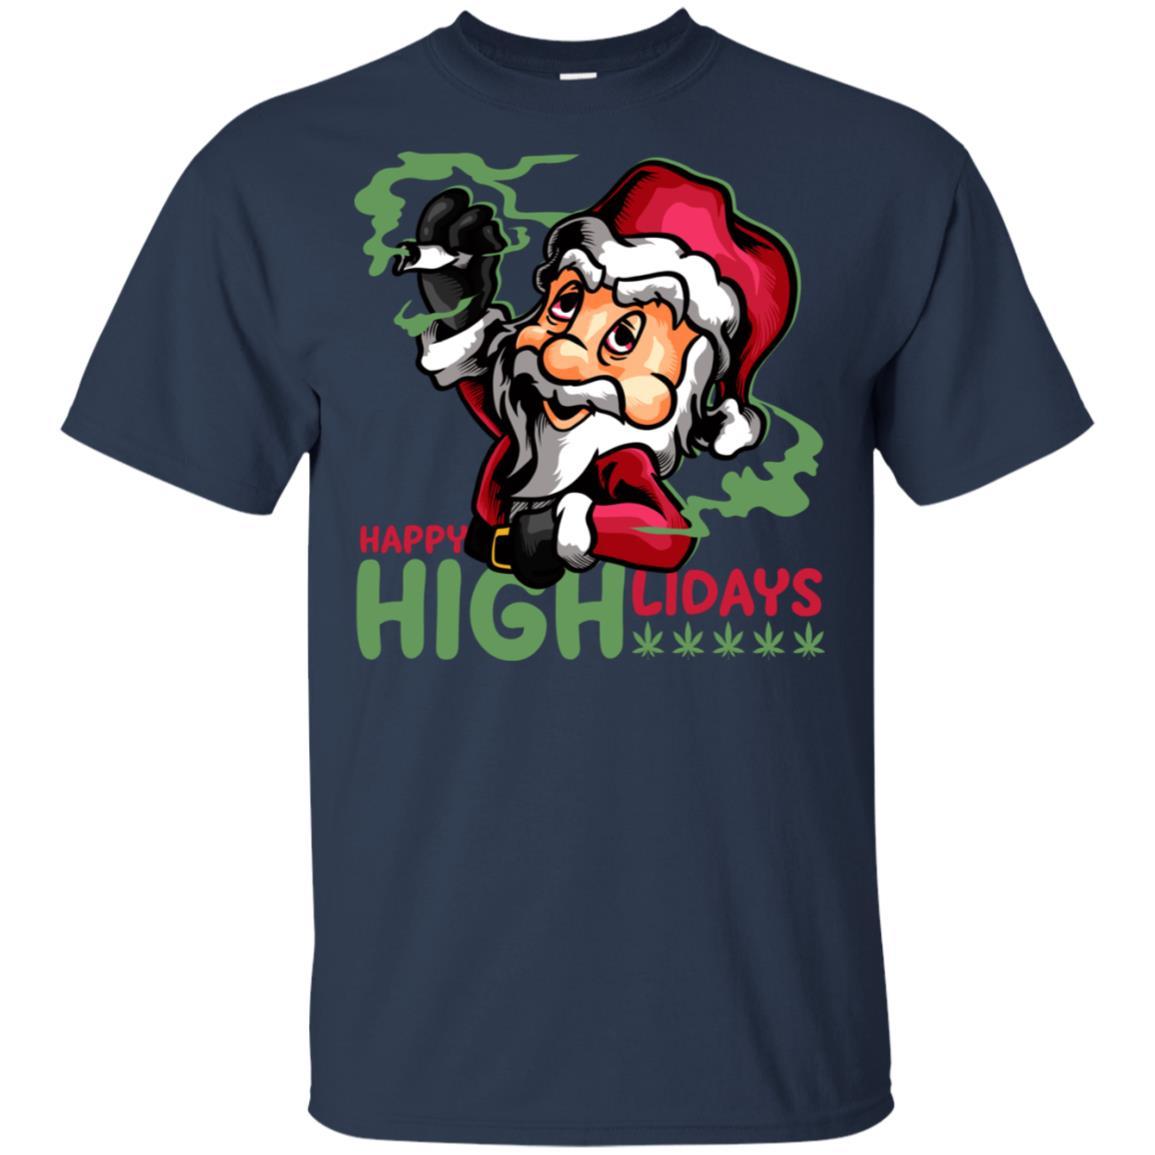 Funny Christmas Santa Smoking Weed Happy Highlidays Unisex Short Sleeve